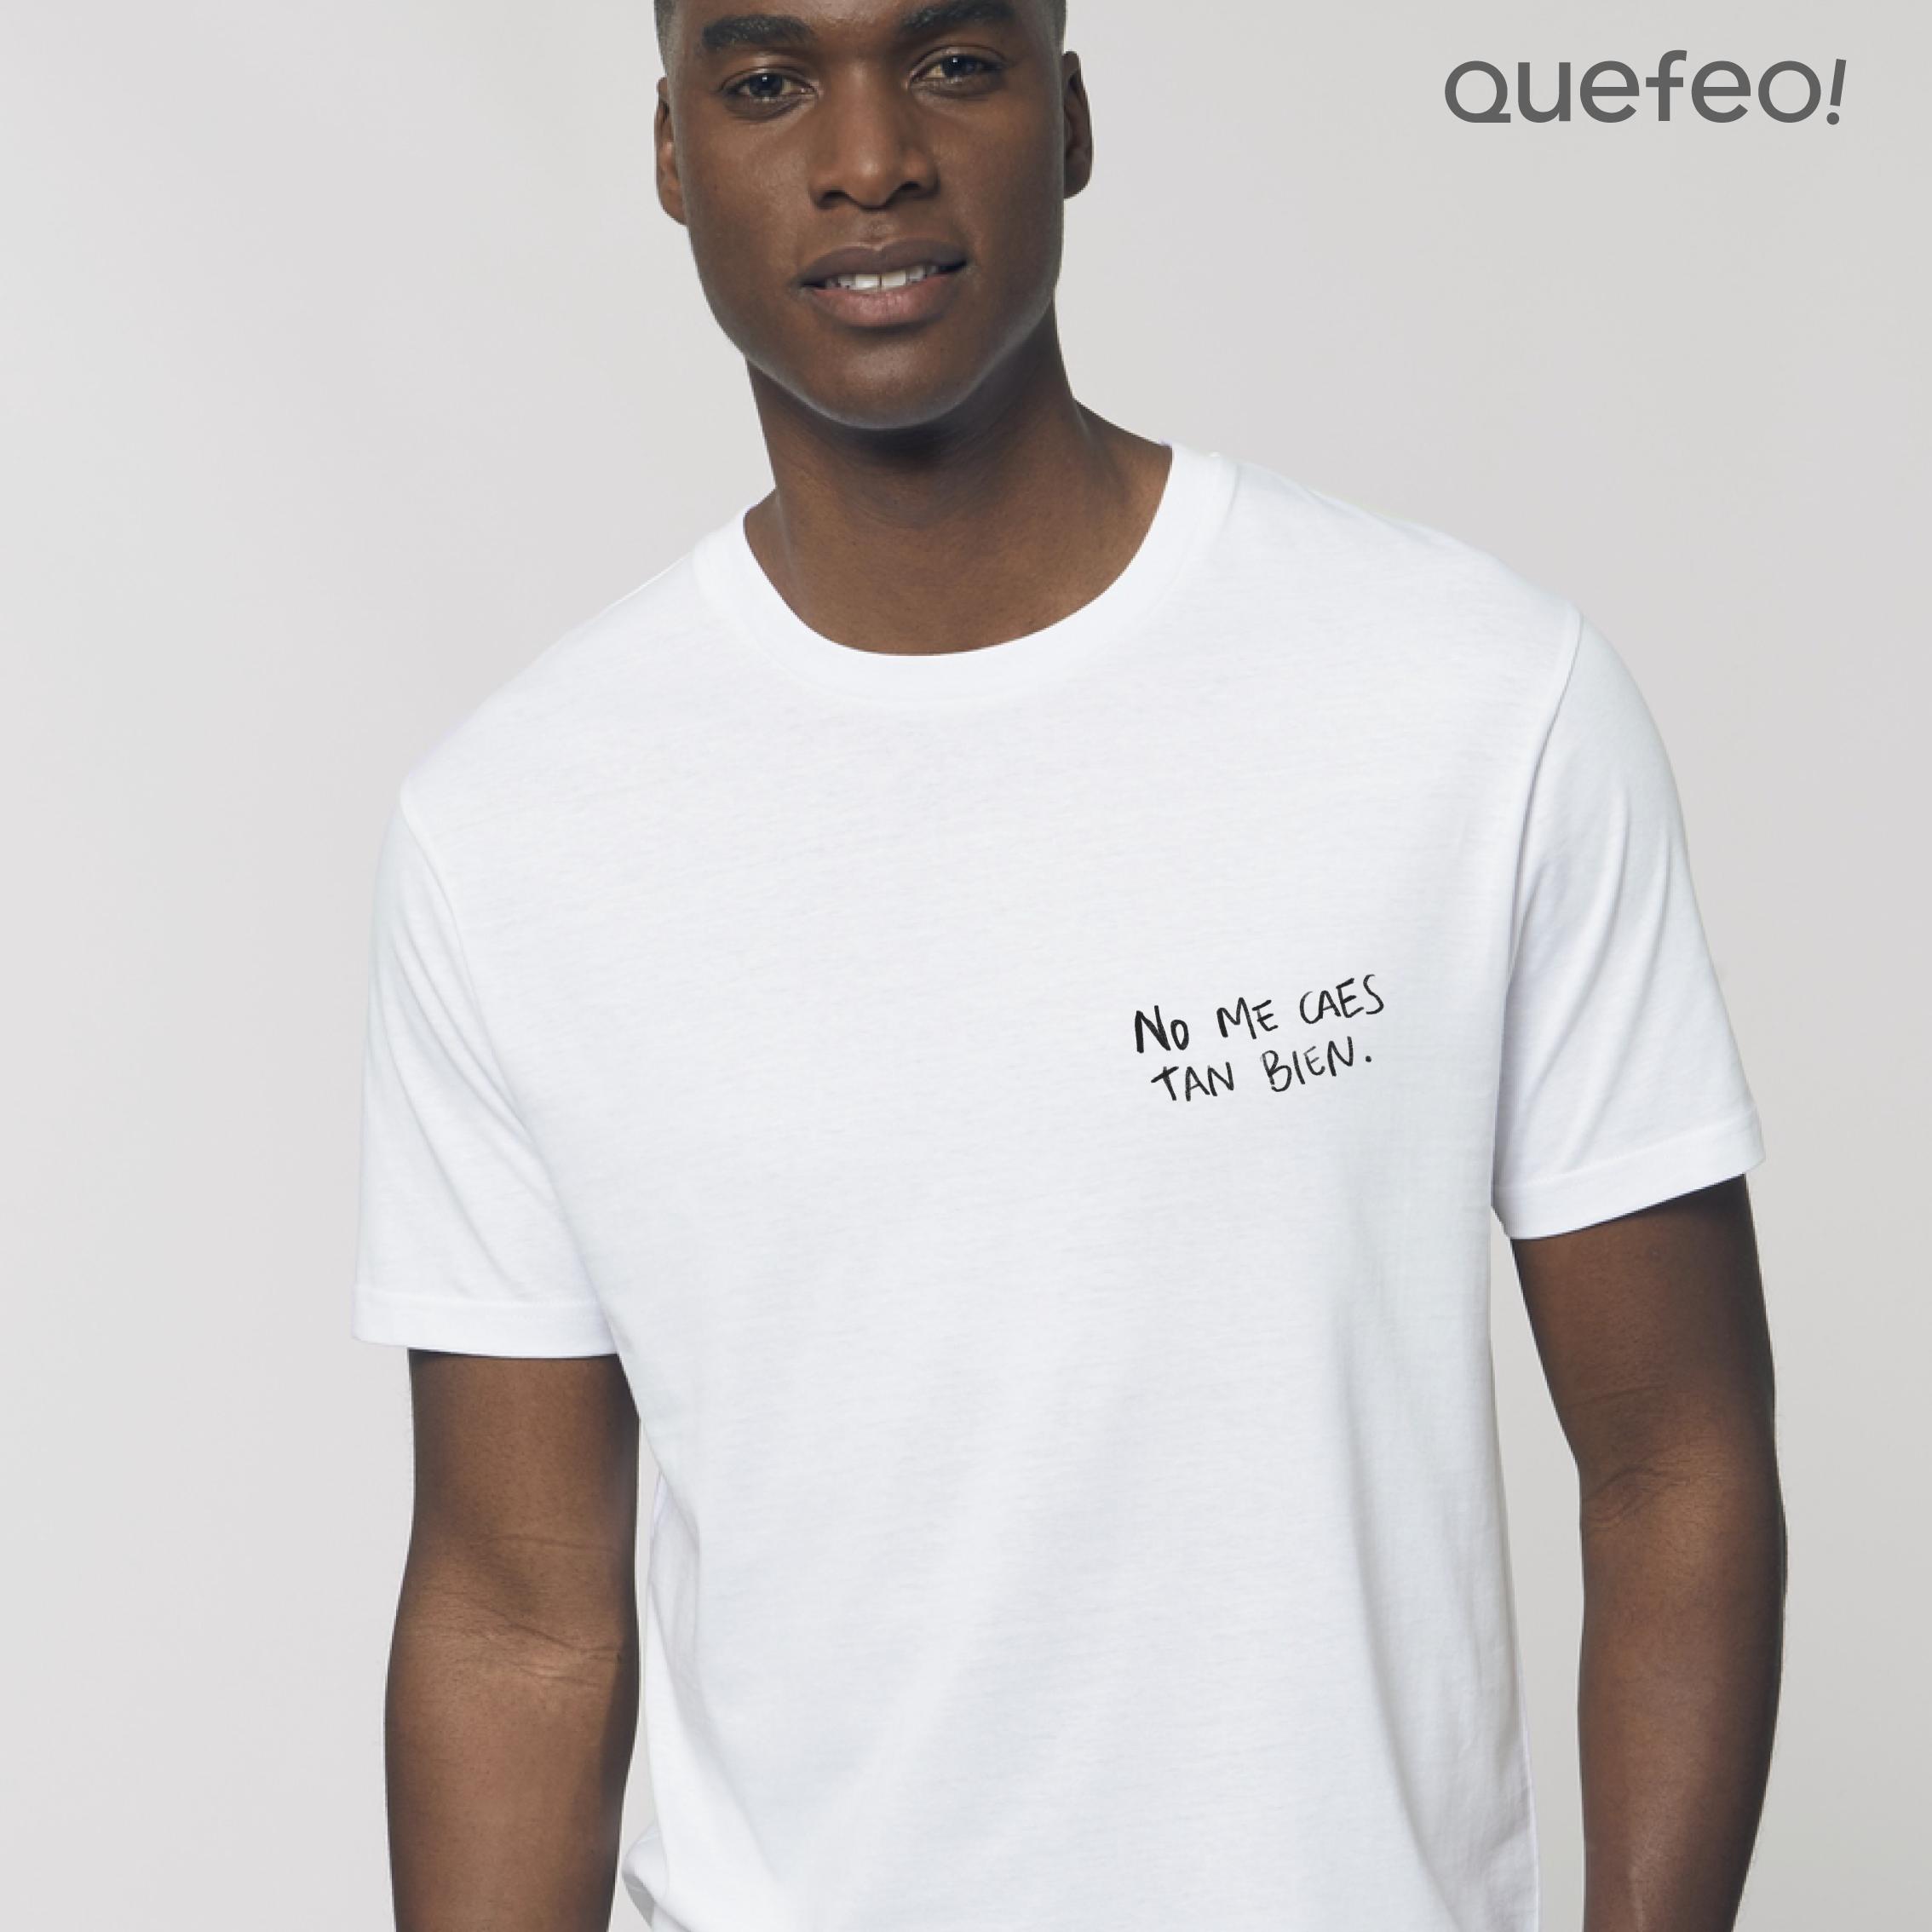 camiseta con mensaje unisex